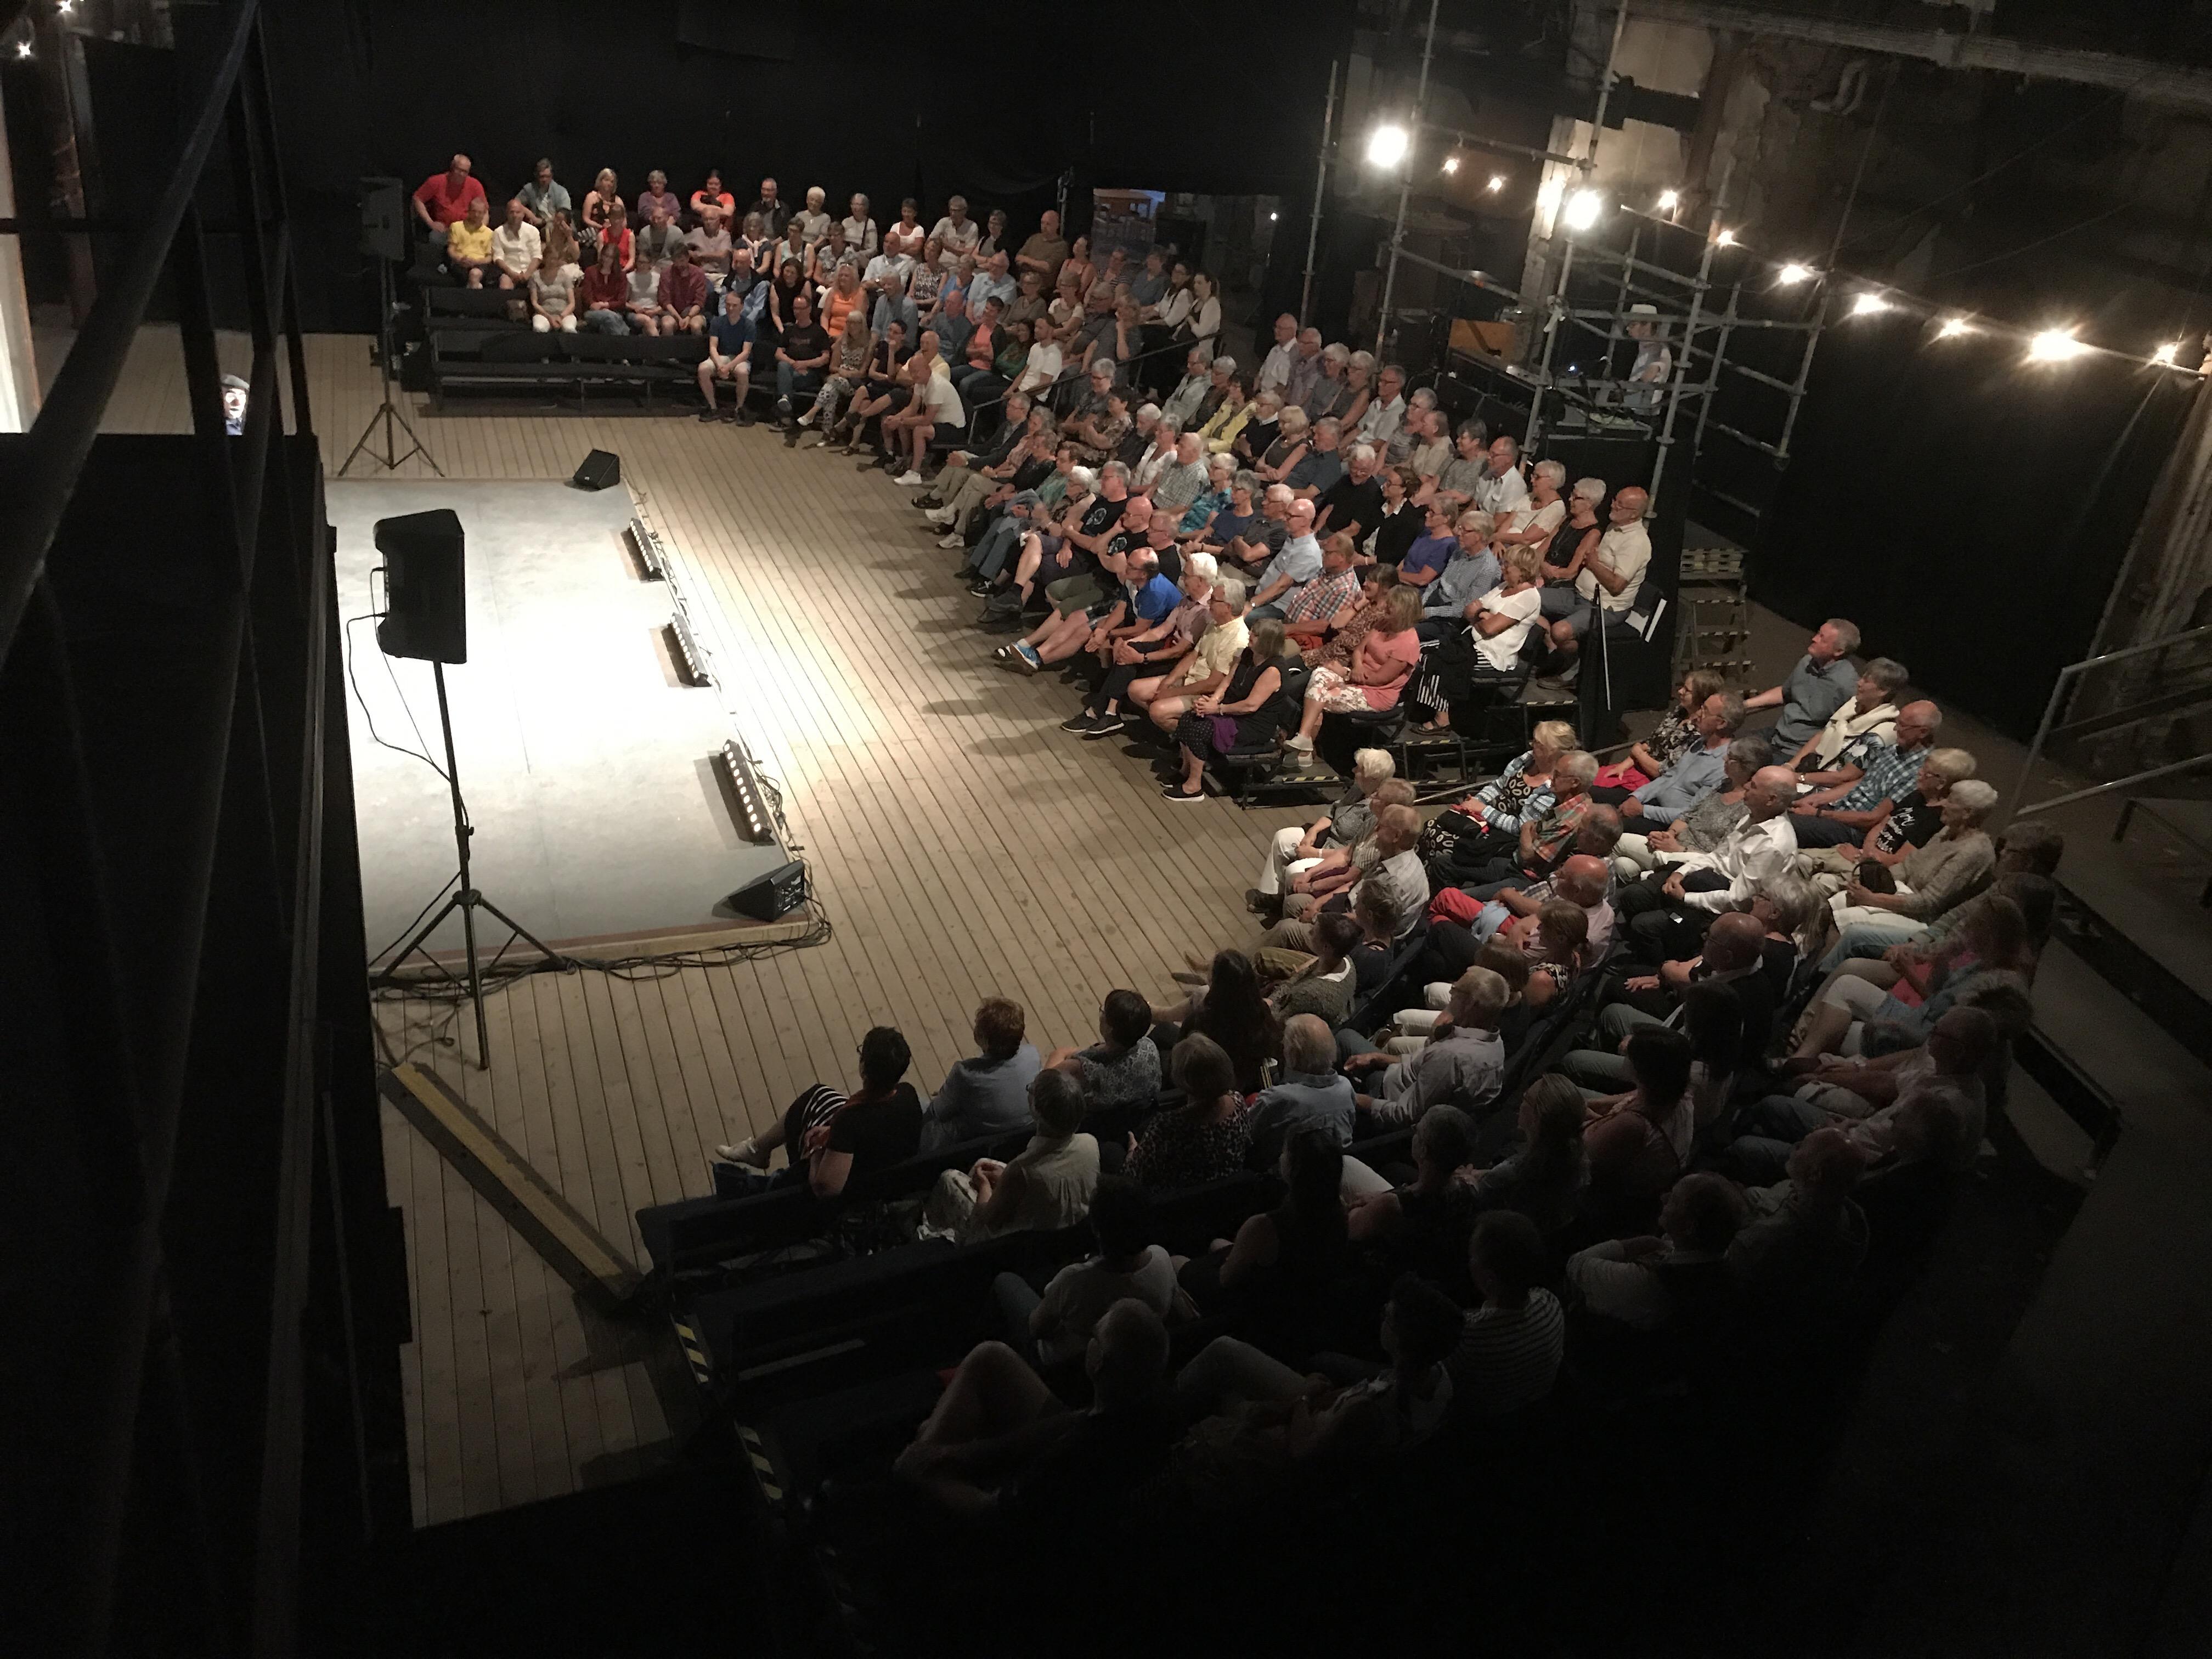 Gjuteriet - Musik & Teater